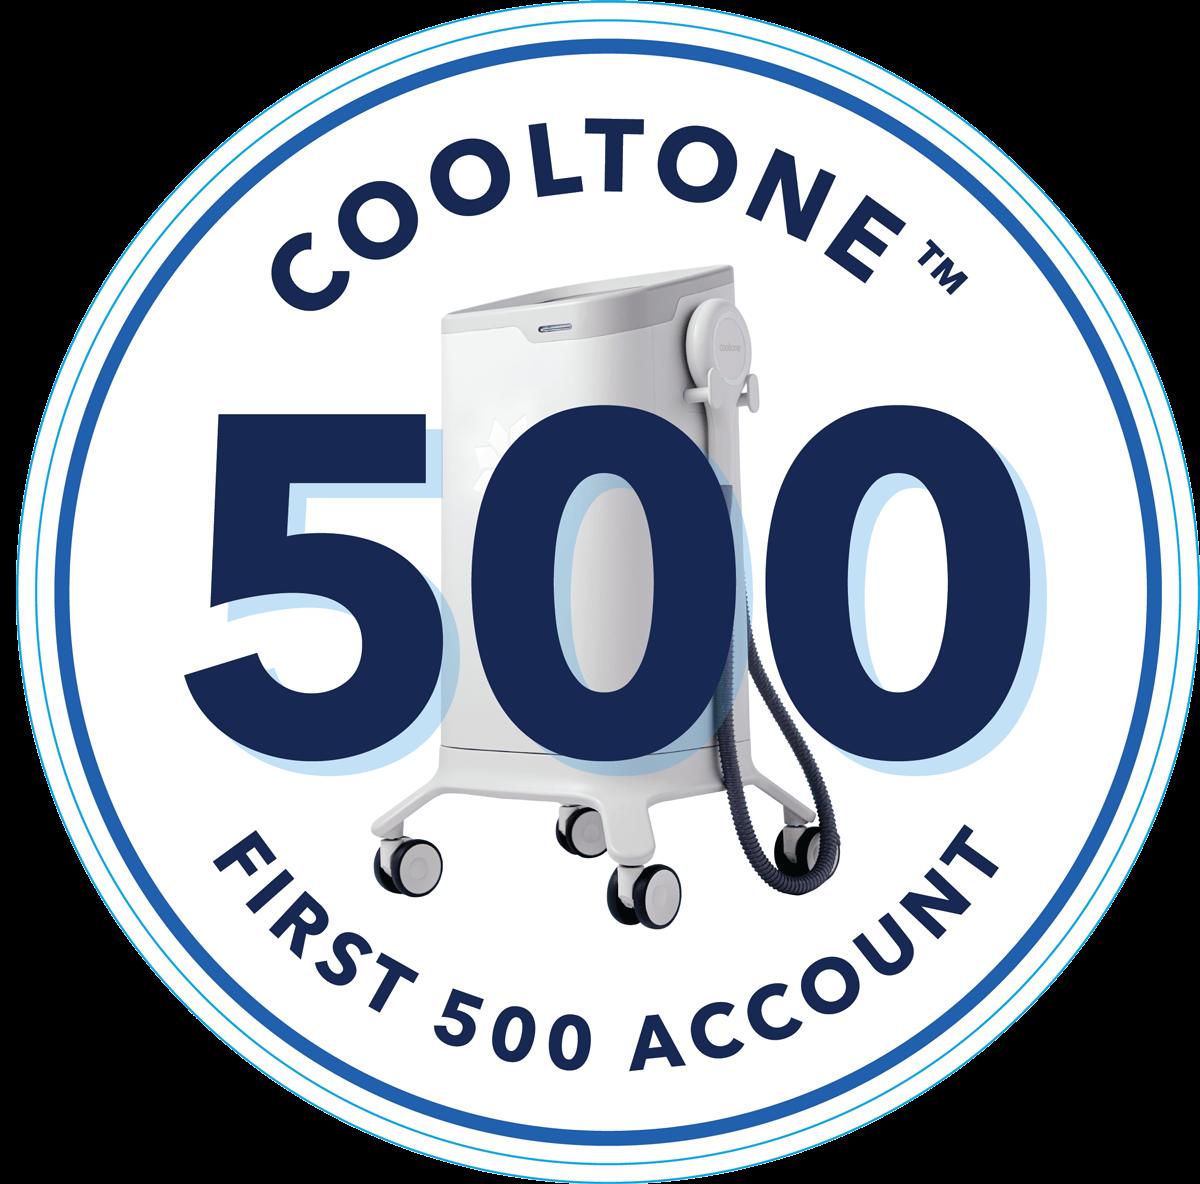 CoolTone Badge